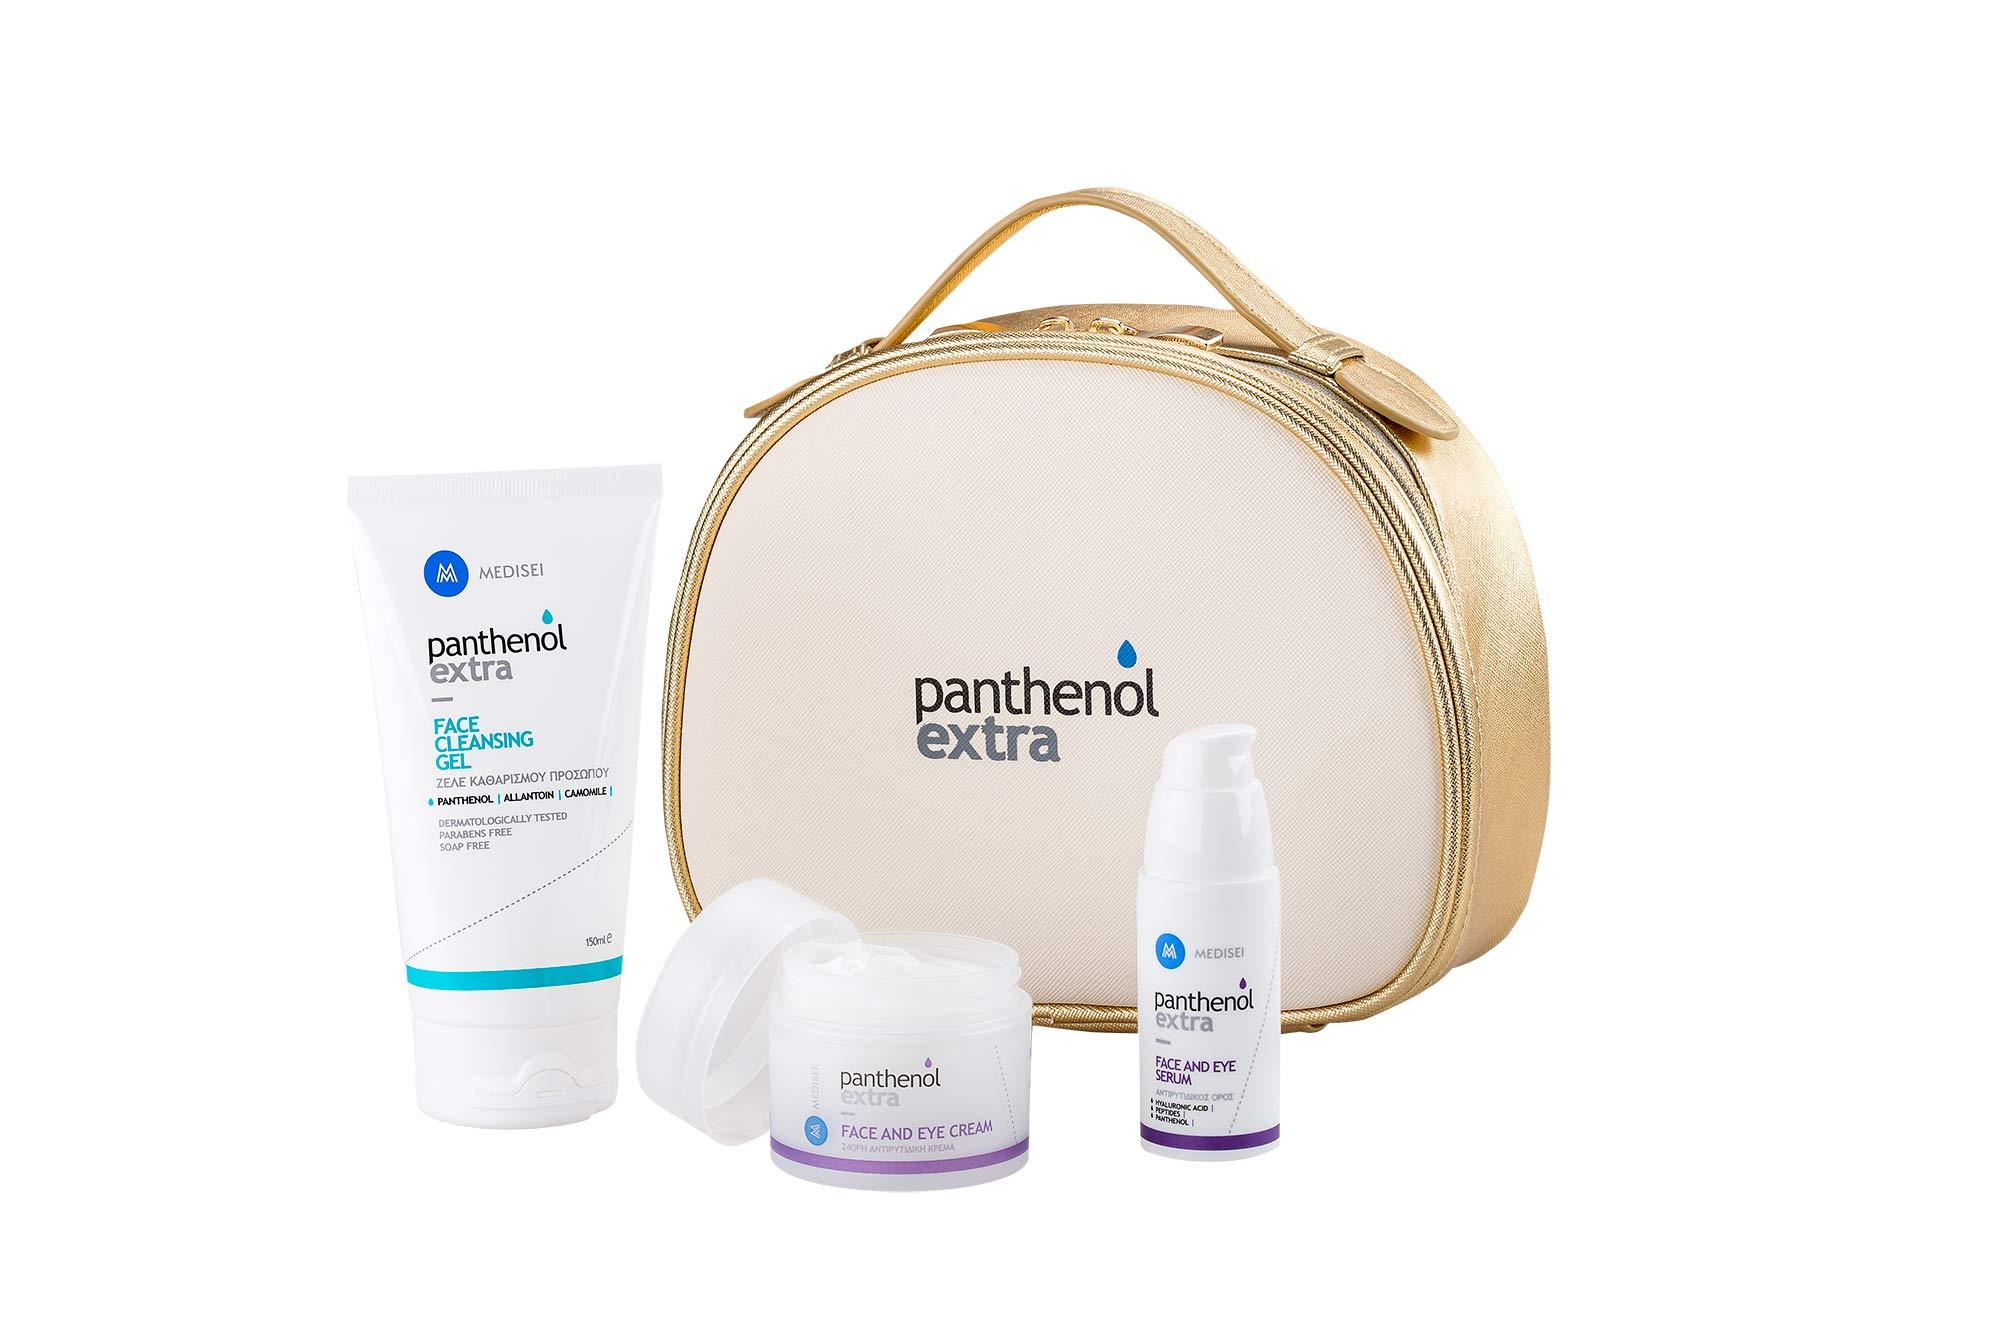 Panthenol Extra PROMO with Face & Eye Cream 24h, 50ml, Face & Eye Serum, 30ml & GIFT Face Cleansing Gel, 150ml in a Travel Case